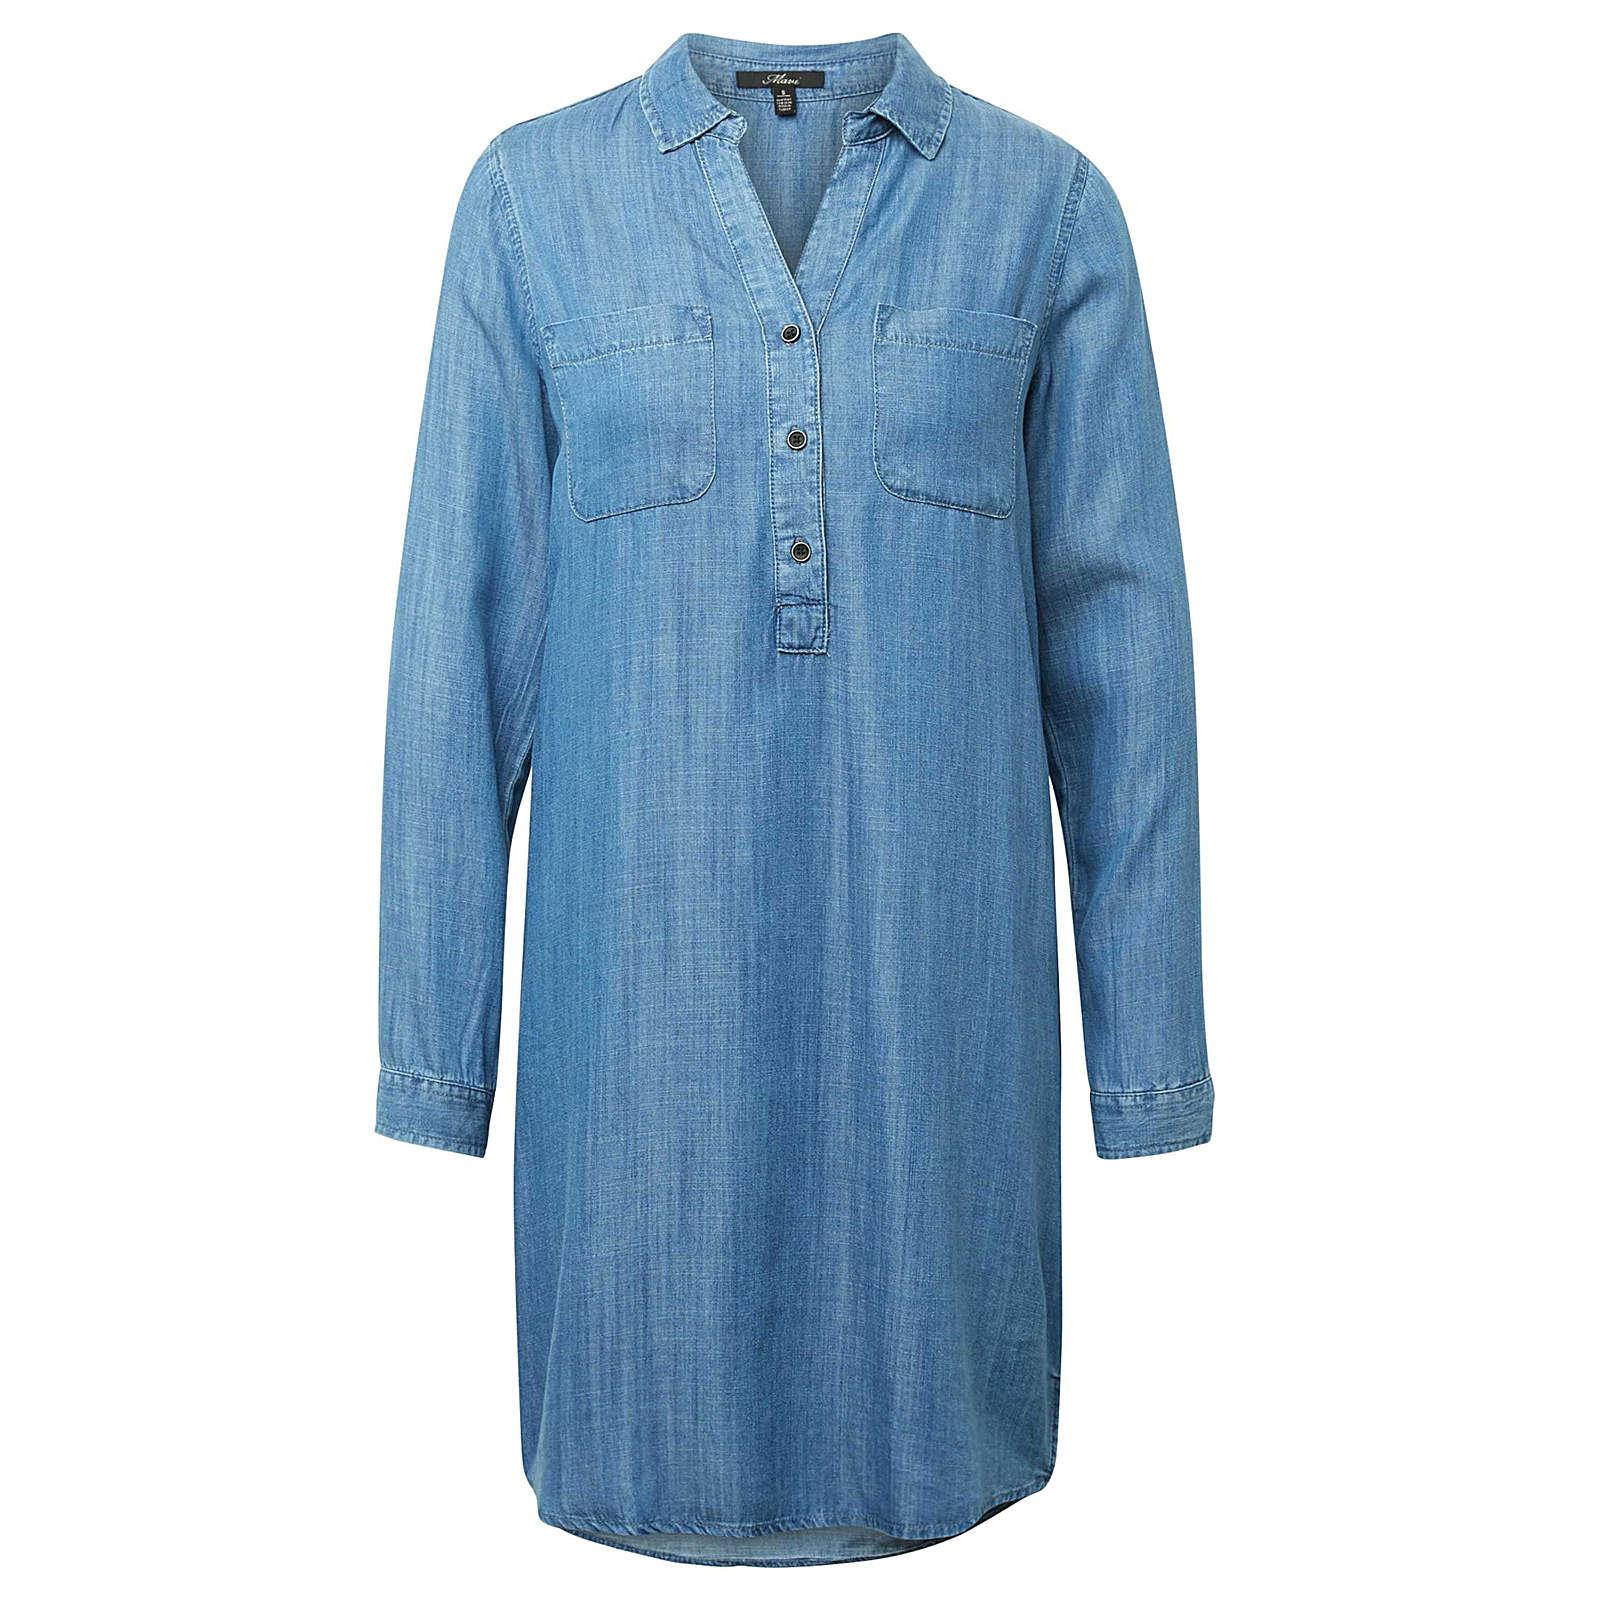 Mavi Blusenkleid DENIM DRESS Blusenkleider blue denim Damen Gr. 38